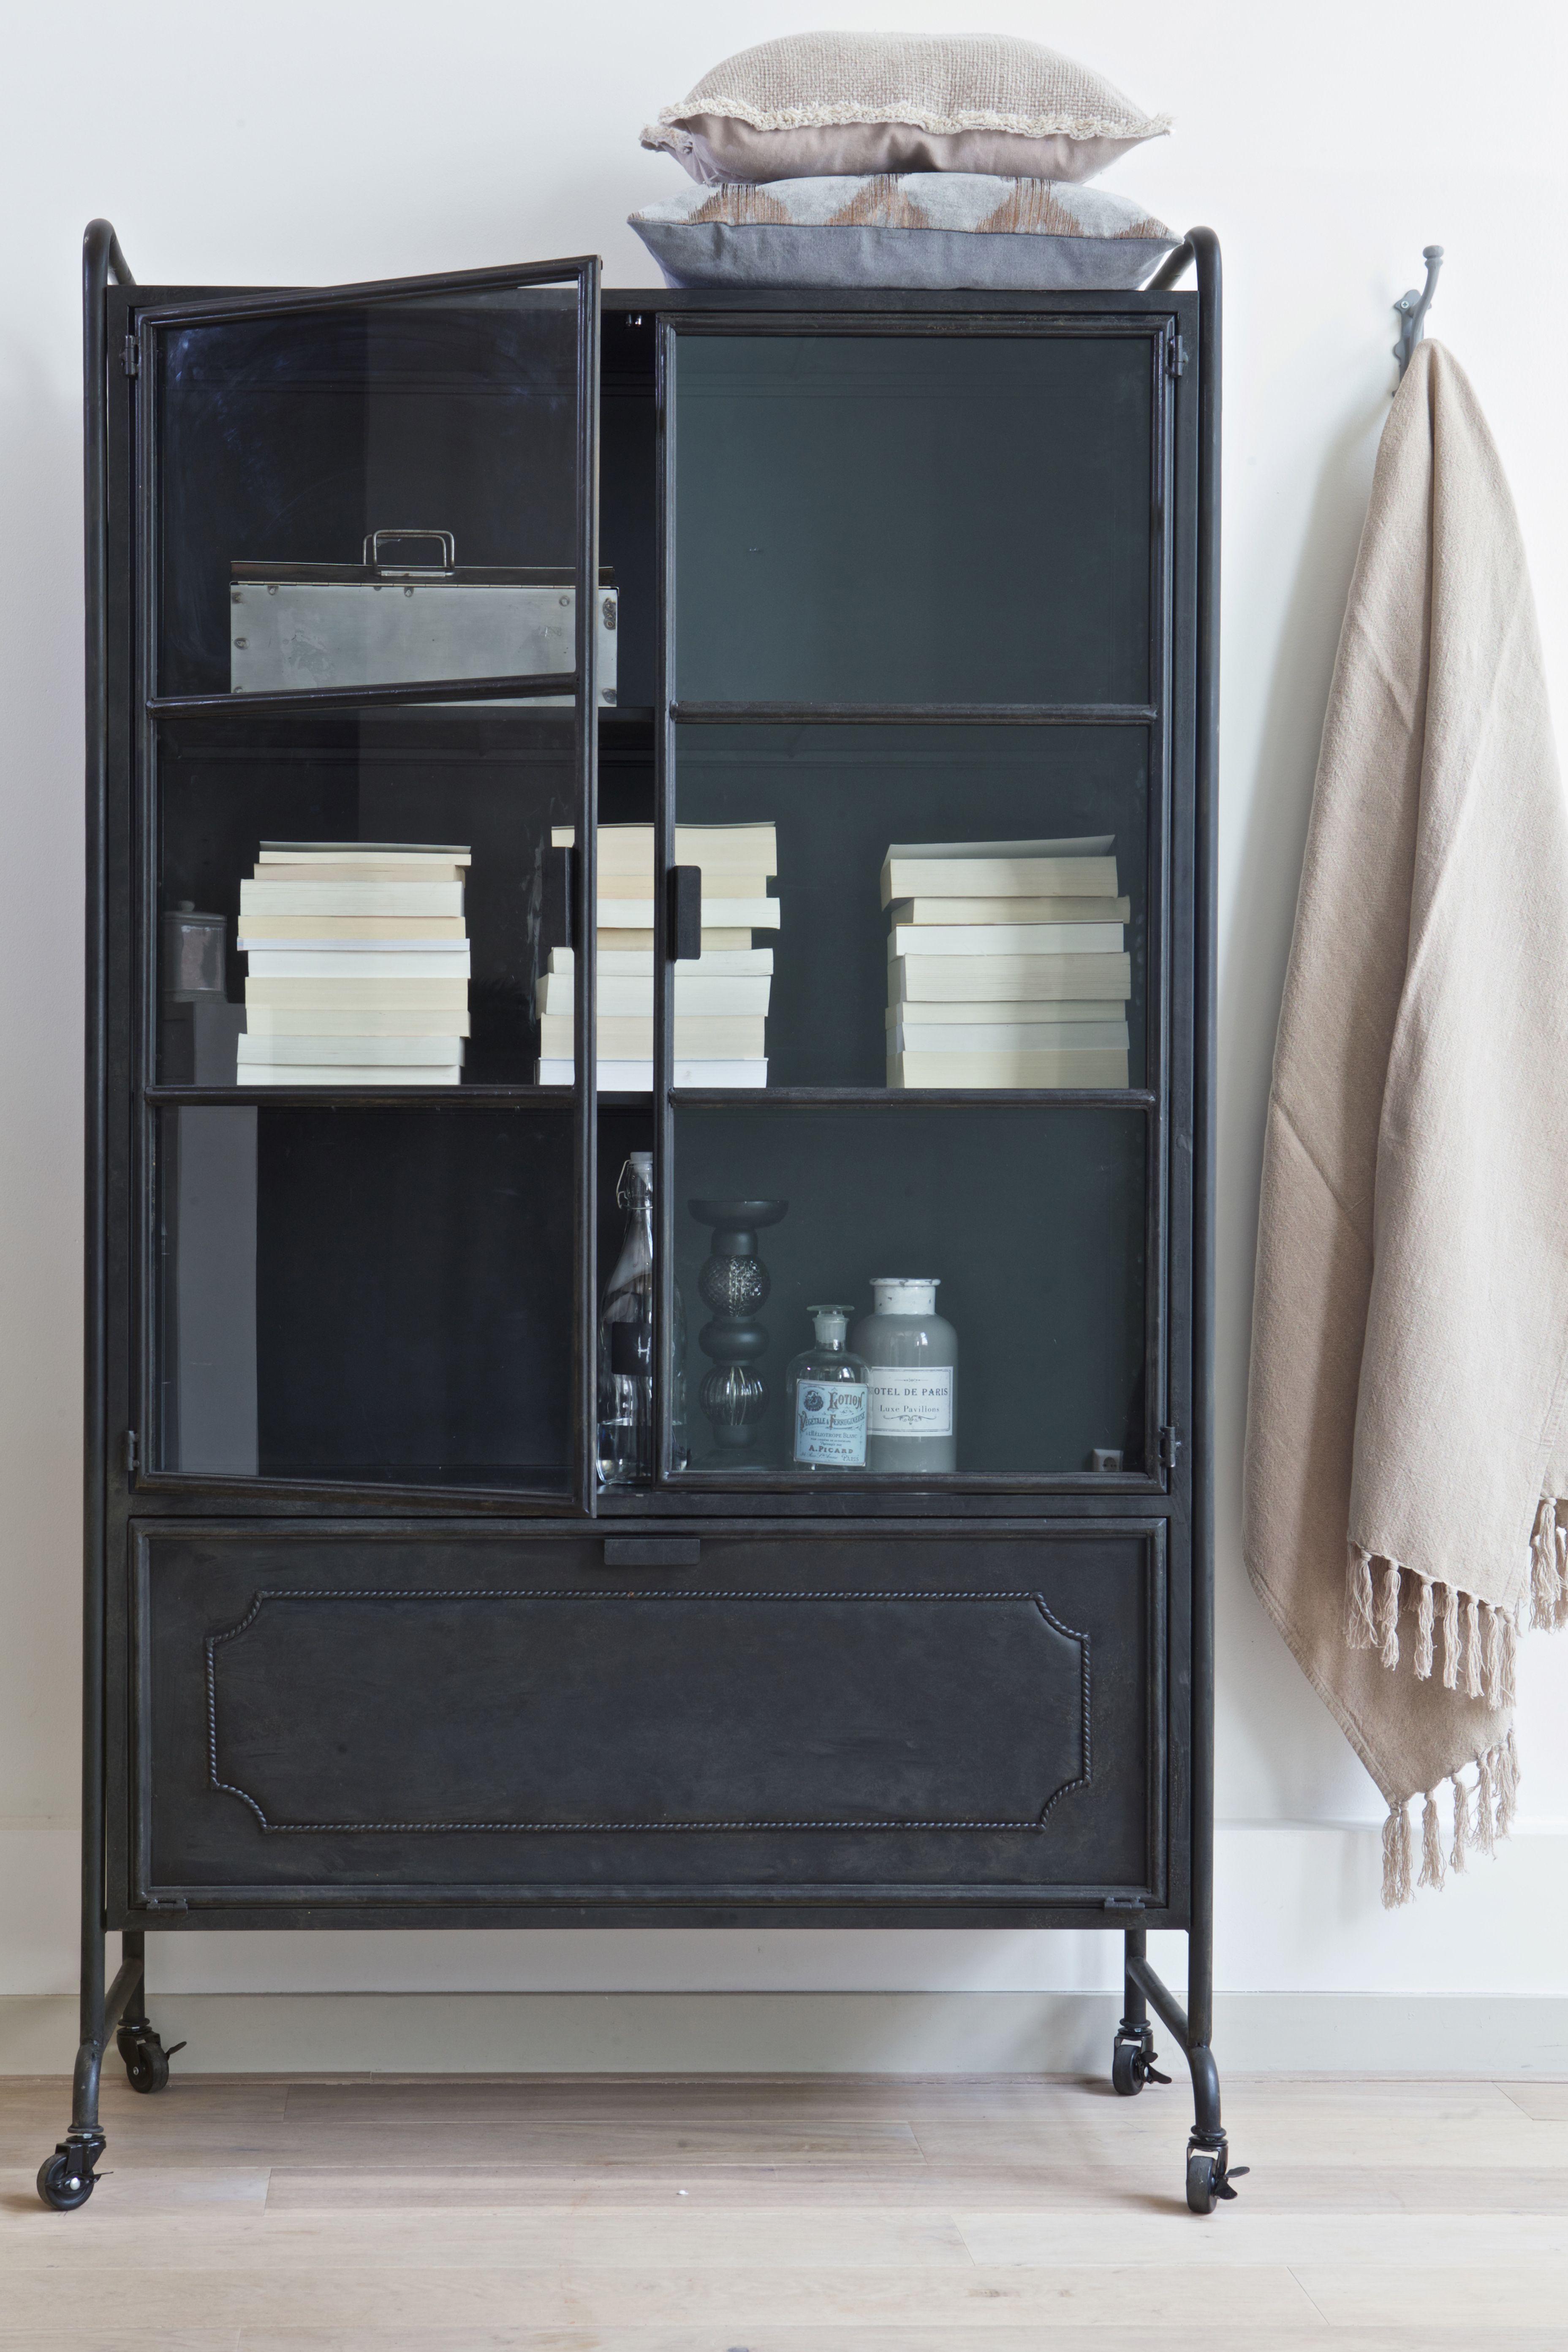 10 Coolest Bathroom Storage Ideas For An Efficient Home Metal Storage Cabinets Steel Storage Cabinets Bathroom Storage